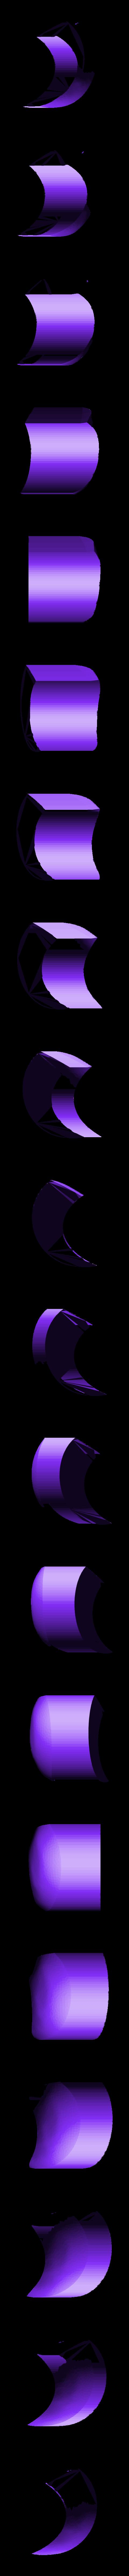 eye_white_left.stl Download free STL file Monster Tweety - multi-color • 3D print template, bpitanga